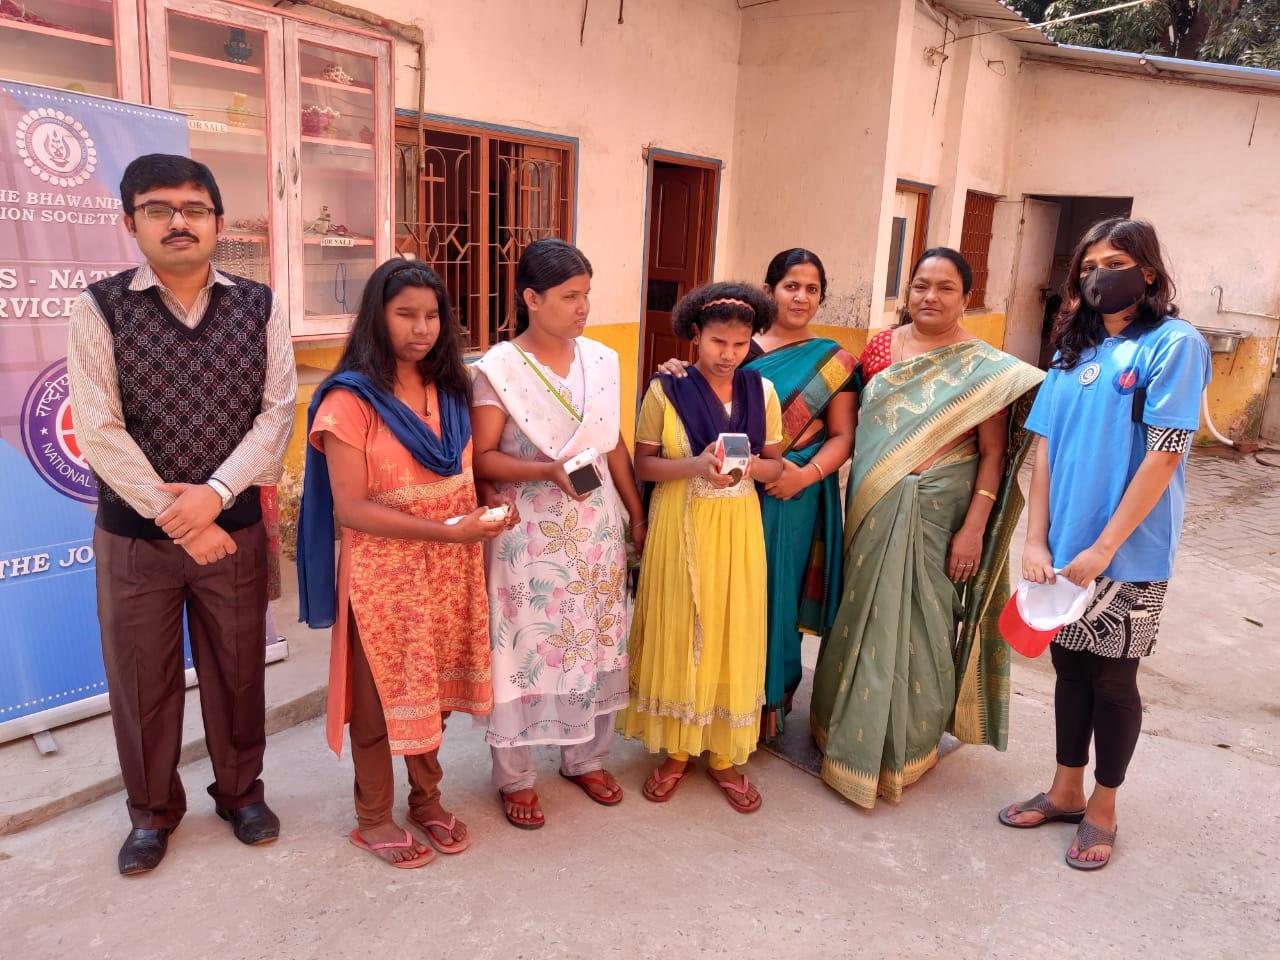 Project Pratidhwani – Audio Books for blind students